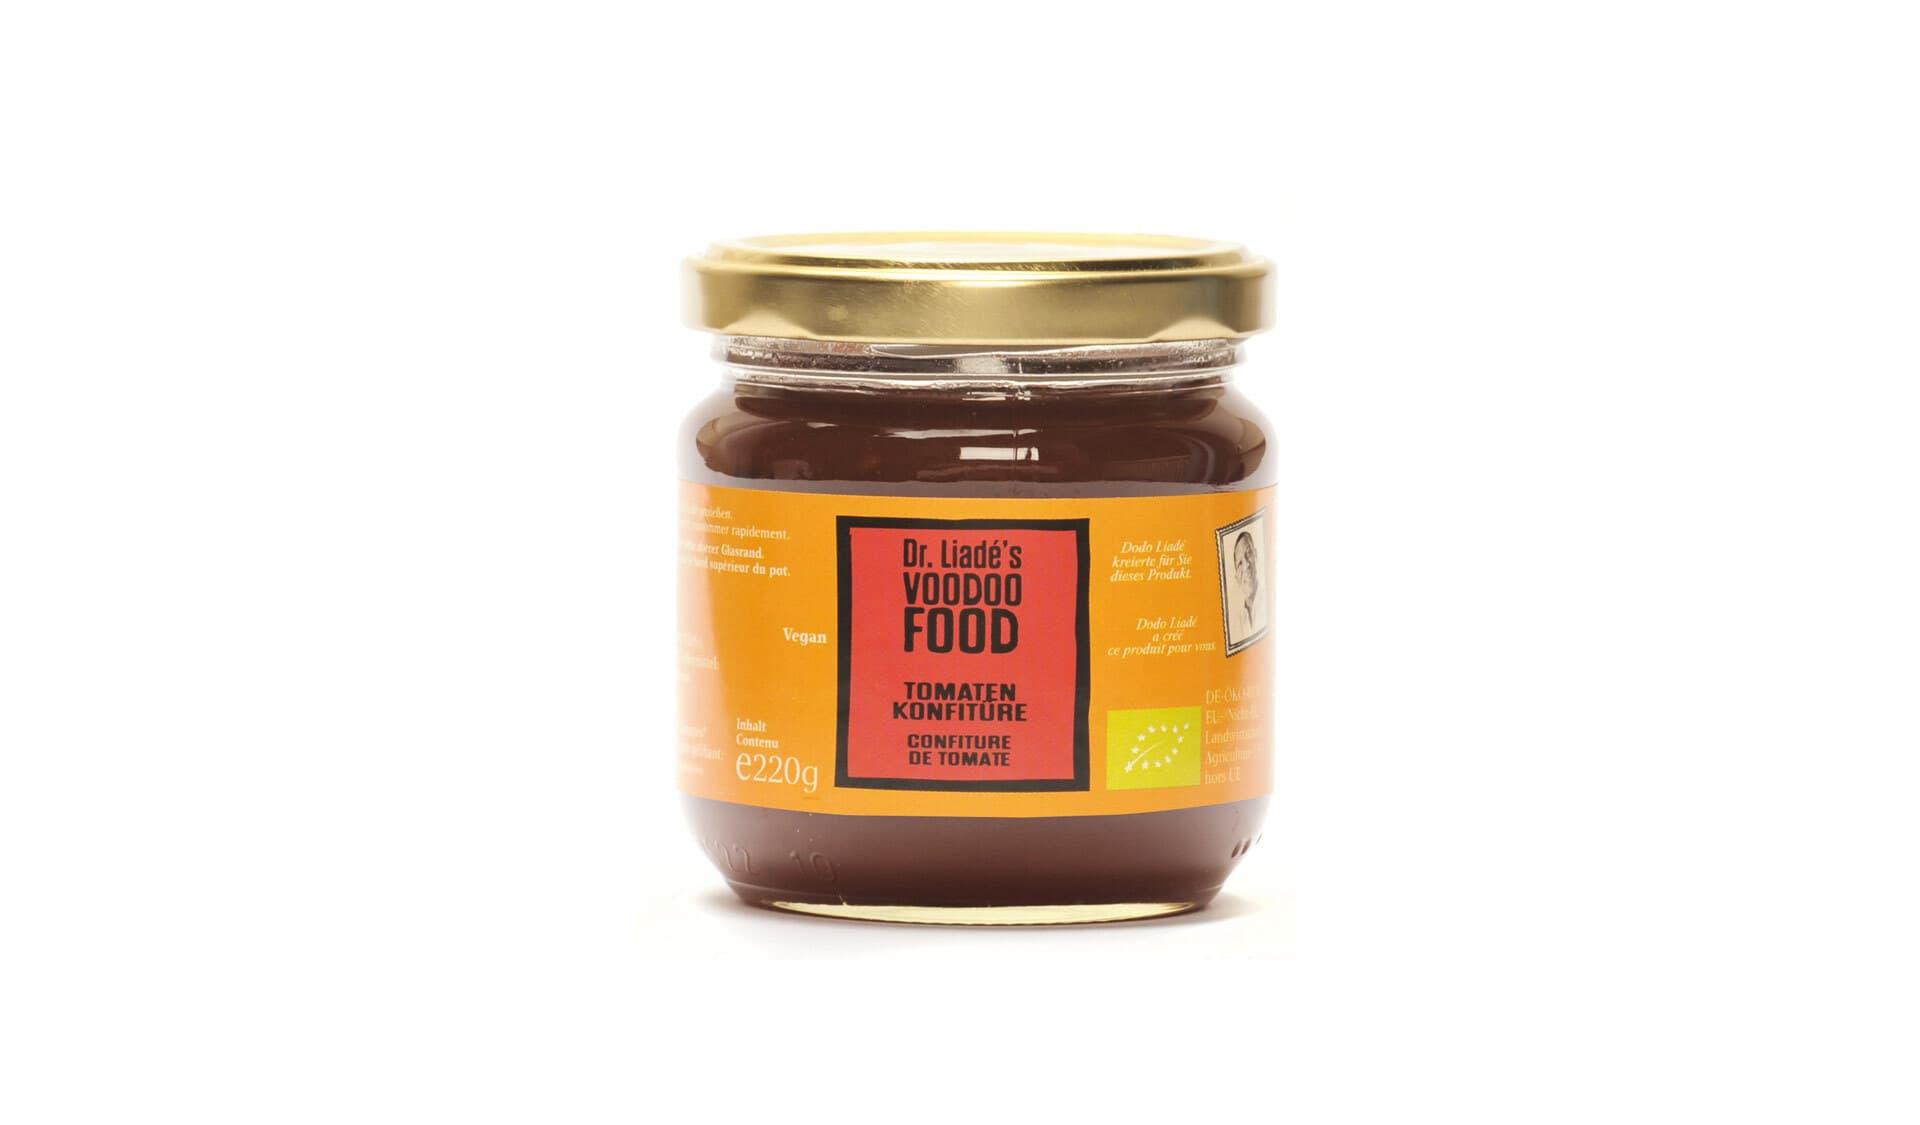 voodoo food: Tomatenkonfitüre